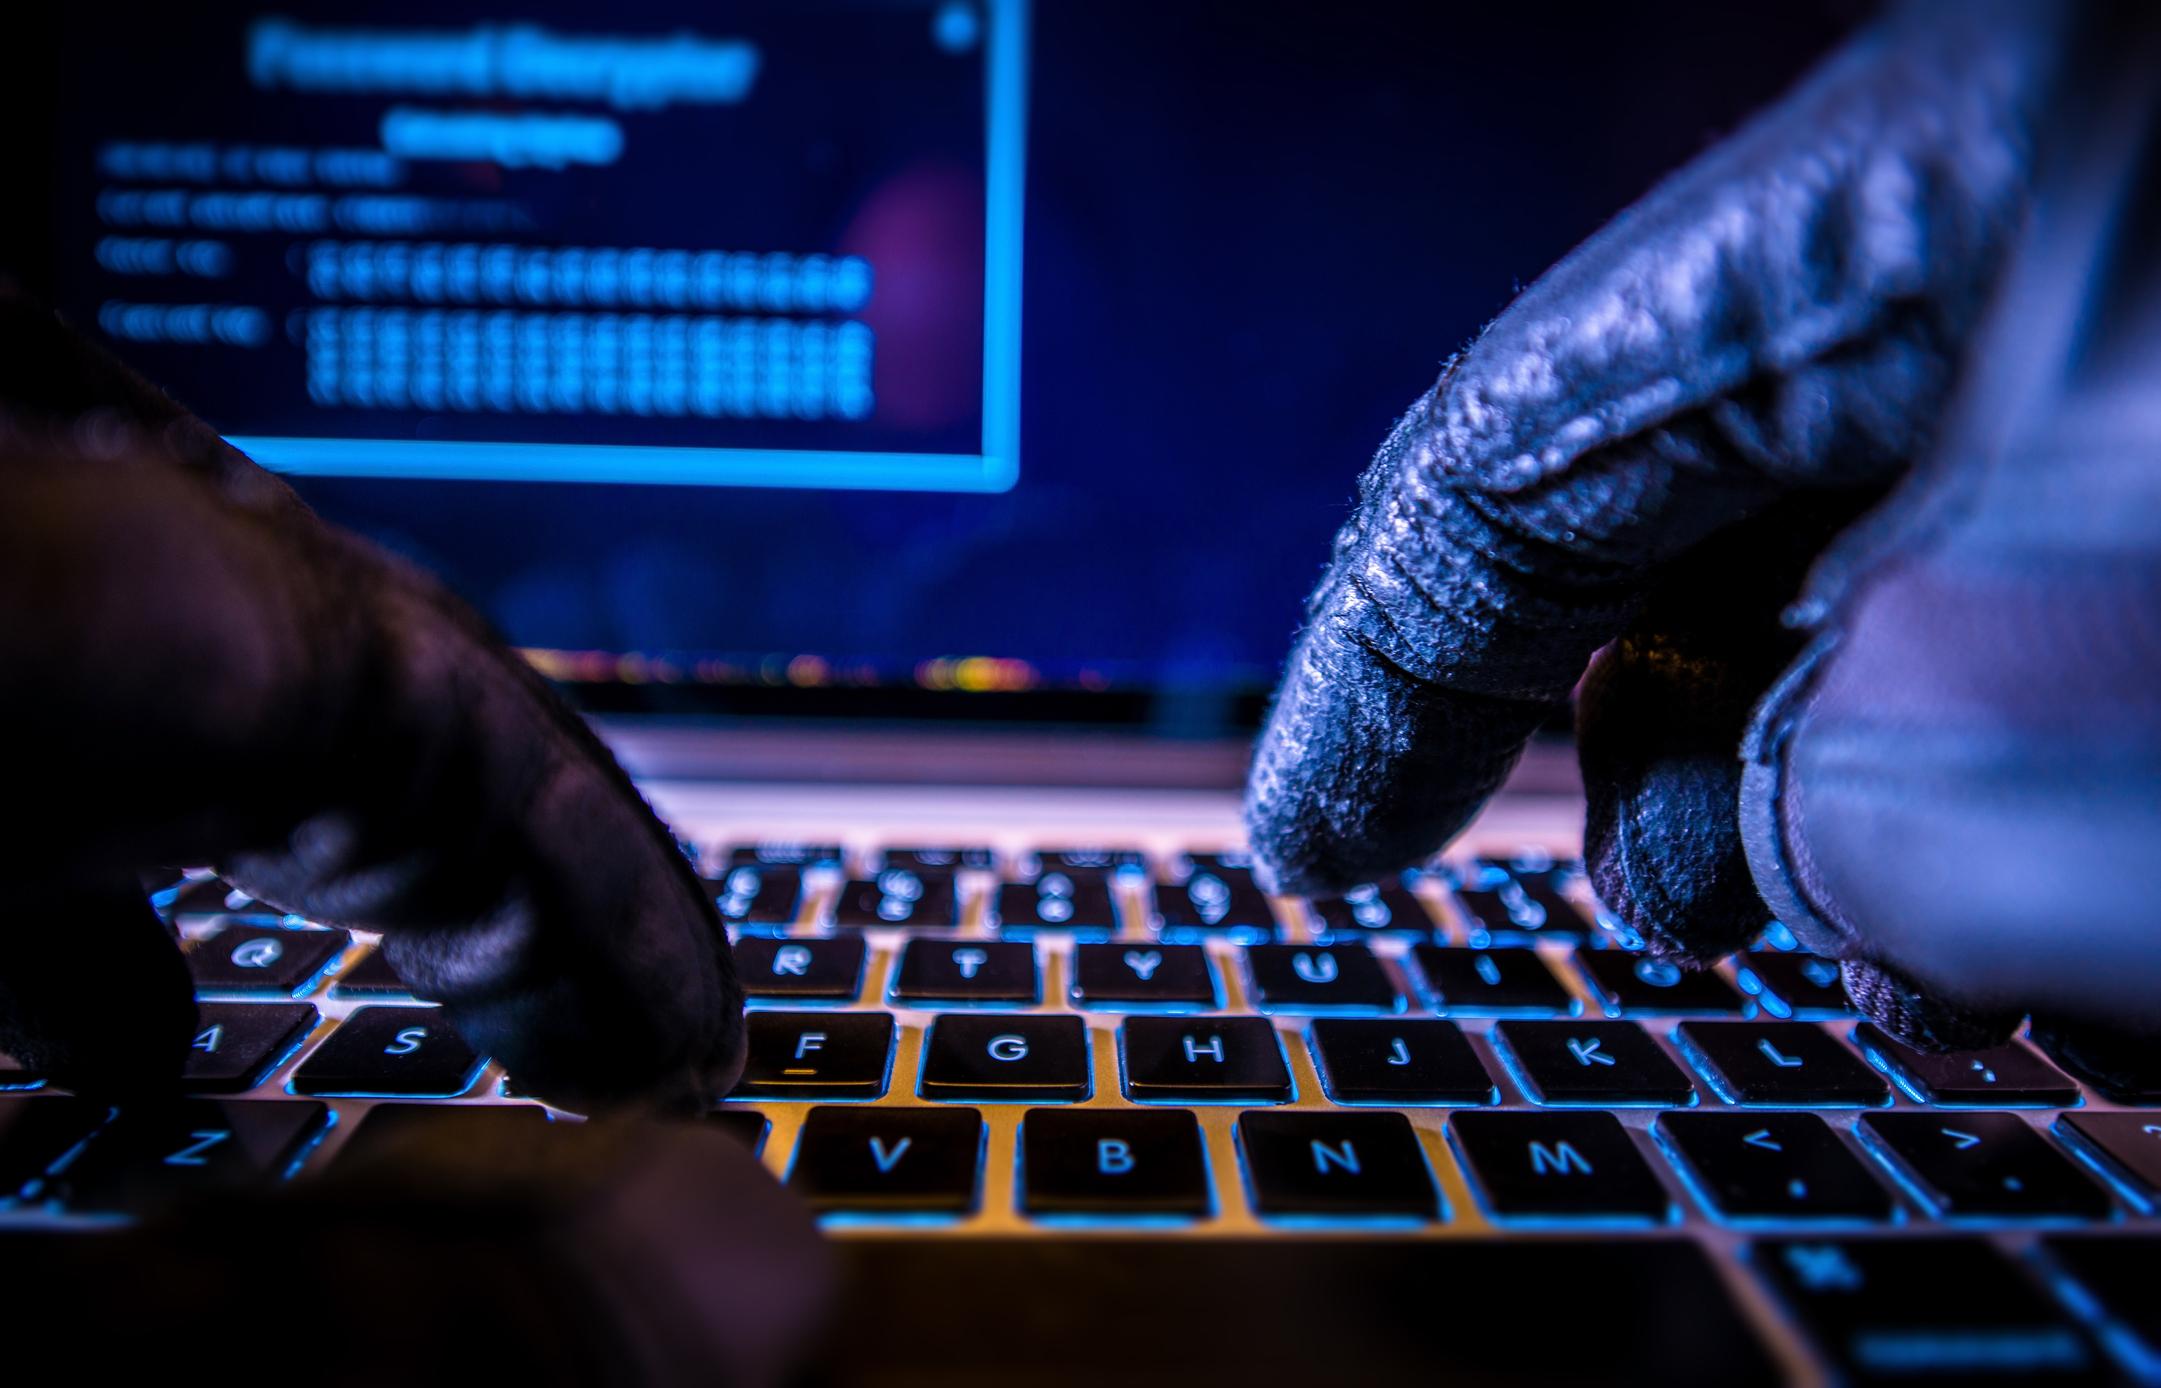 A gloved hacker typing on a lit keyboard in a dark room.